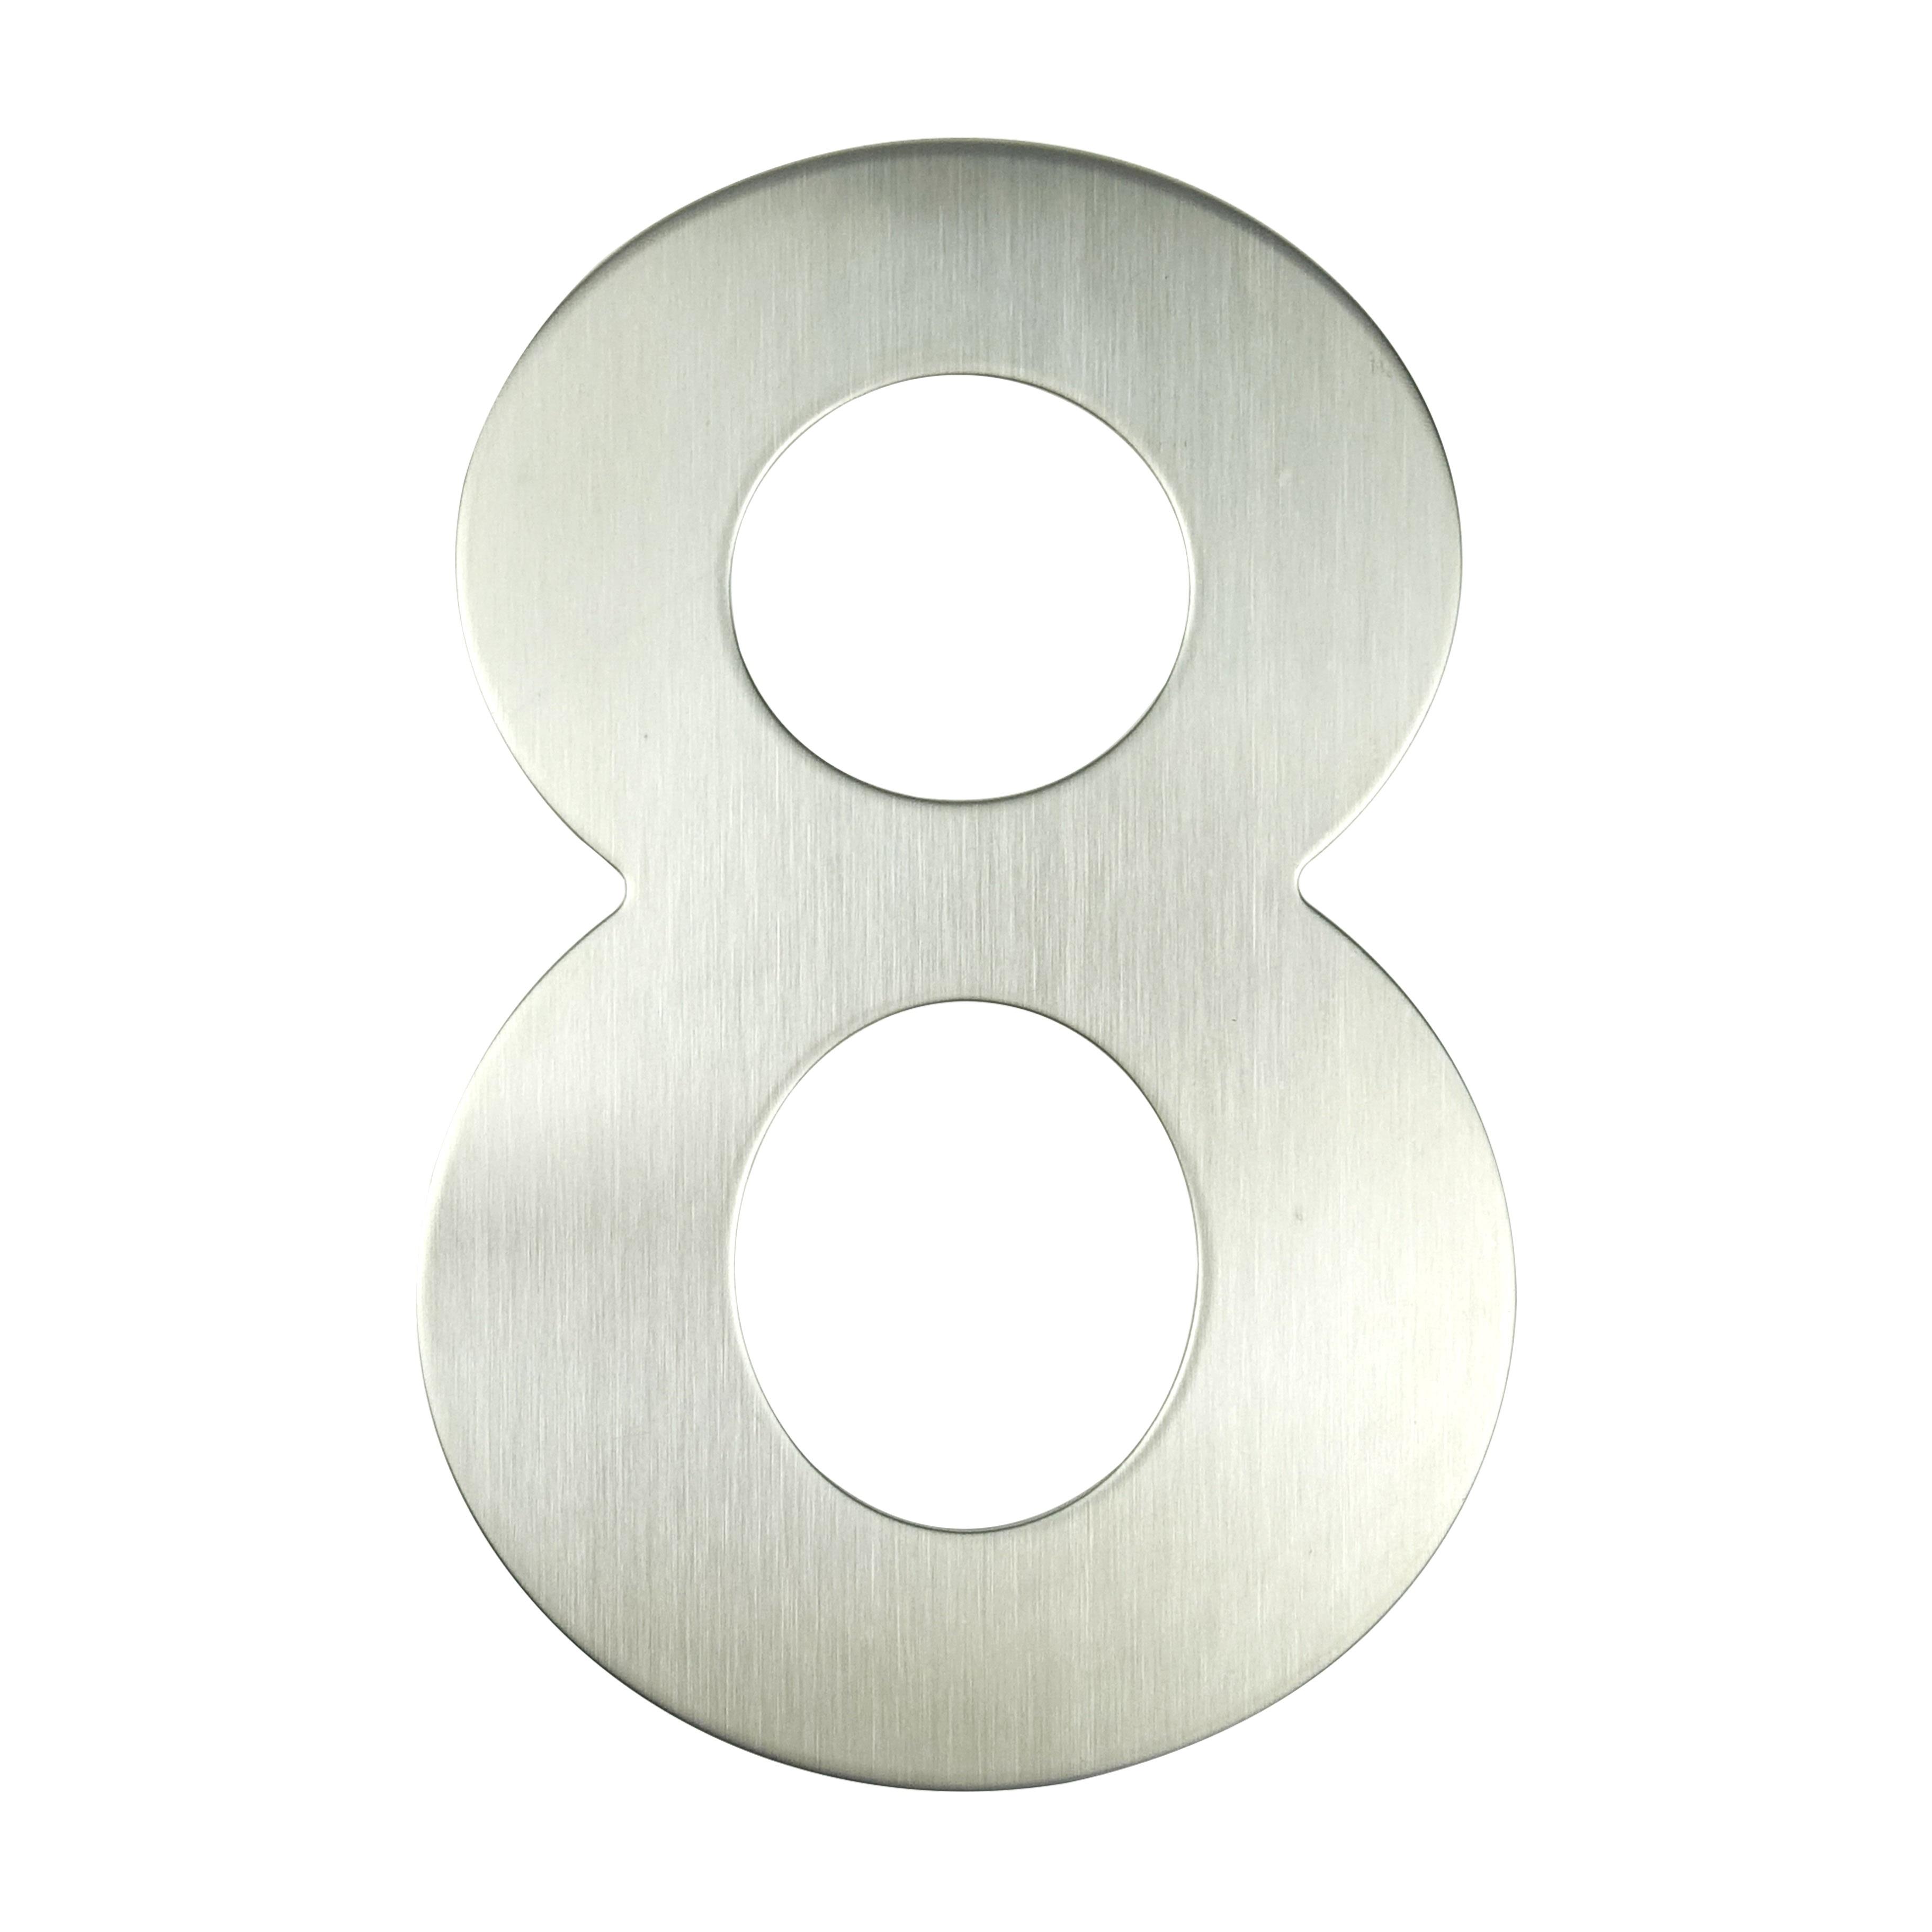 Número de la Casa de 15cm, señal #8 Huisnummer para exteriores, plata,...